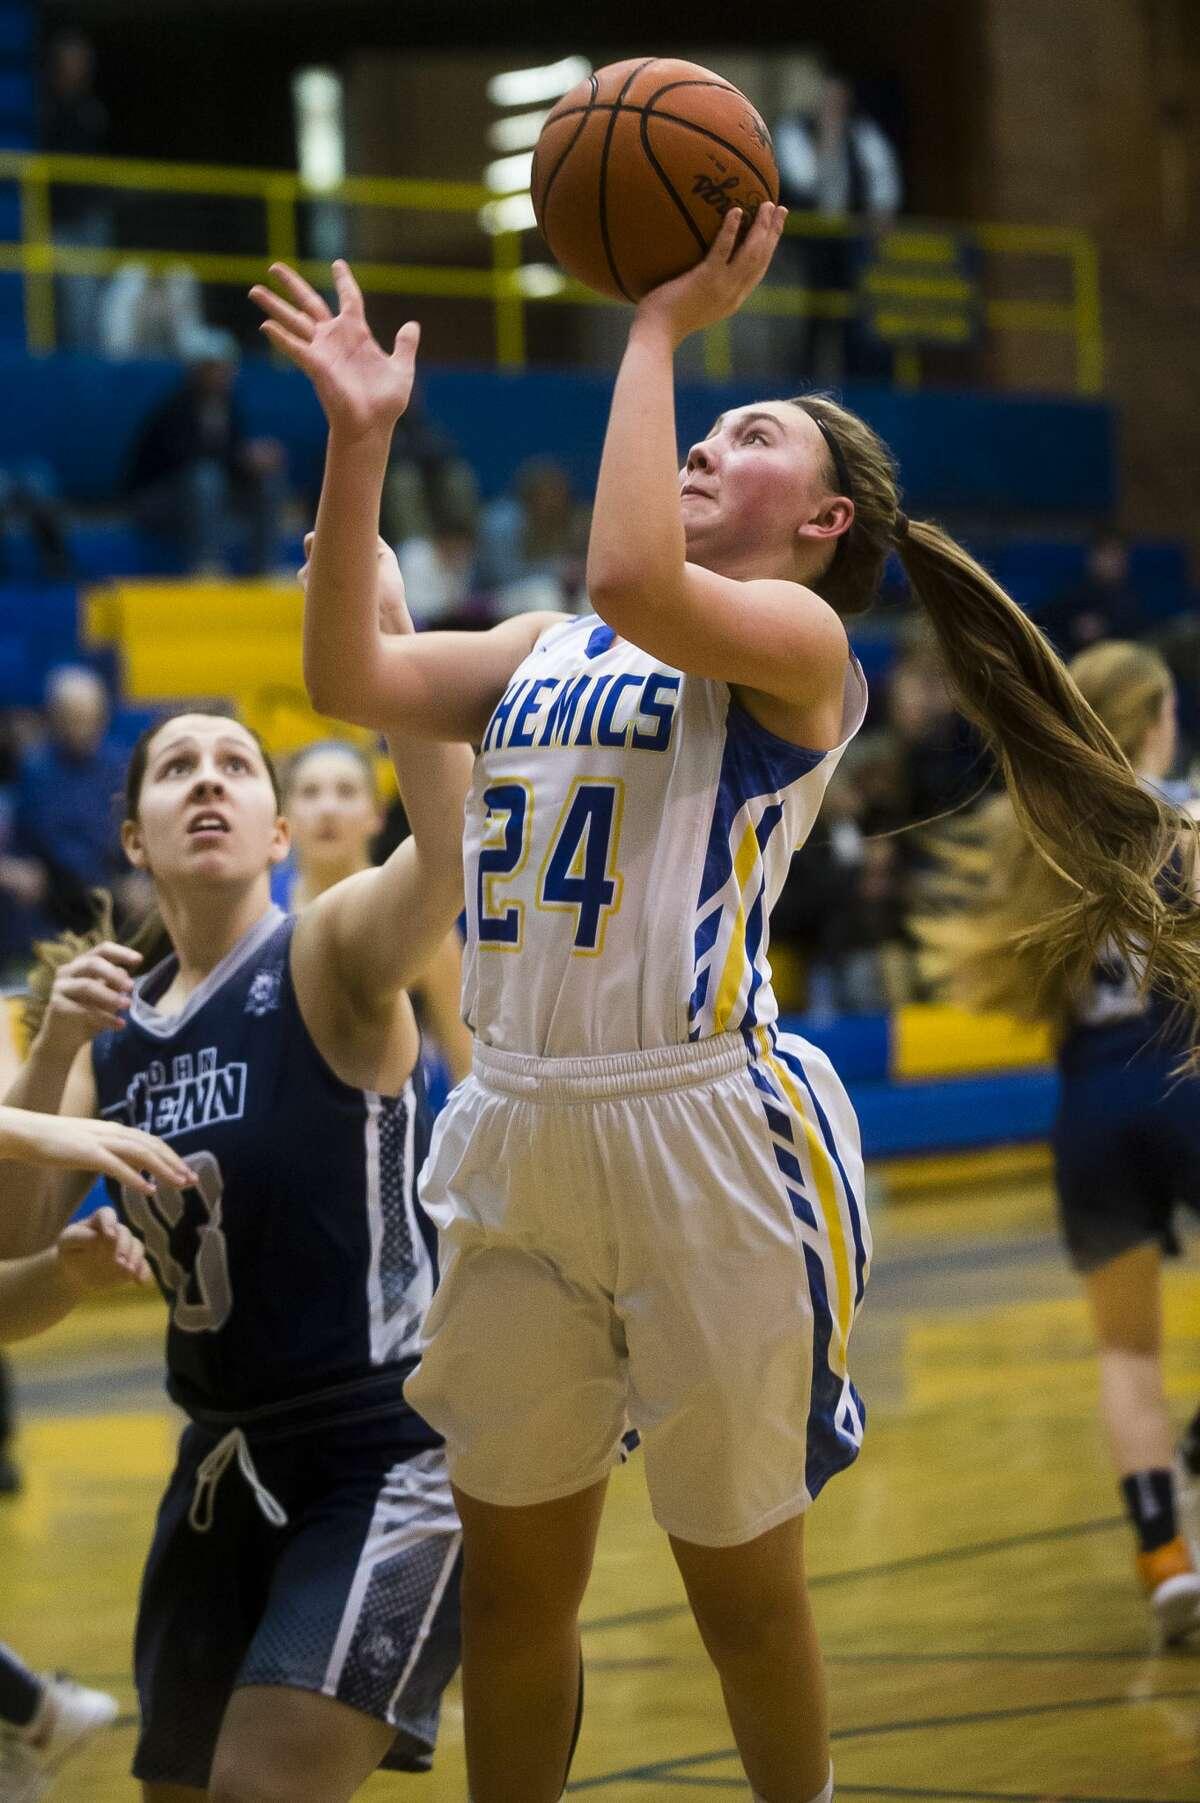 Midland senior Hannah Smith takes a shot during the Chemics' game against John Glenn on Tuesday, Feb. 20, 2018 at Midland High School. (Katy Kildee/kkildee@mdn.net)